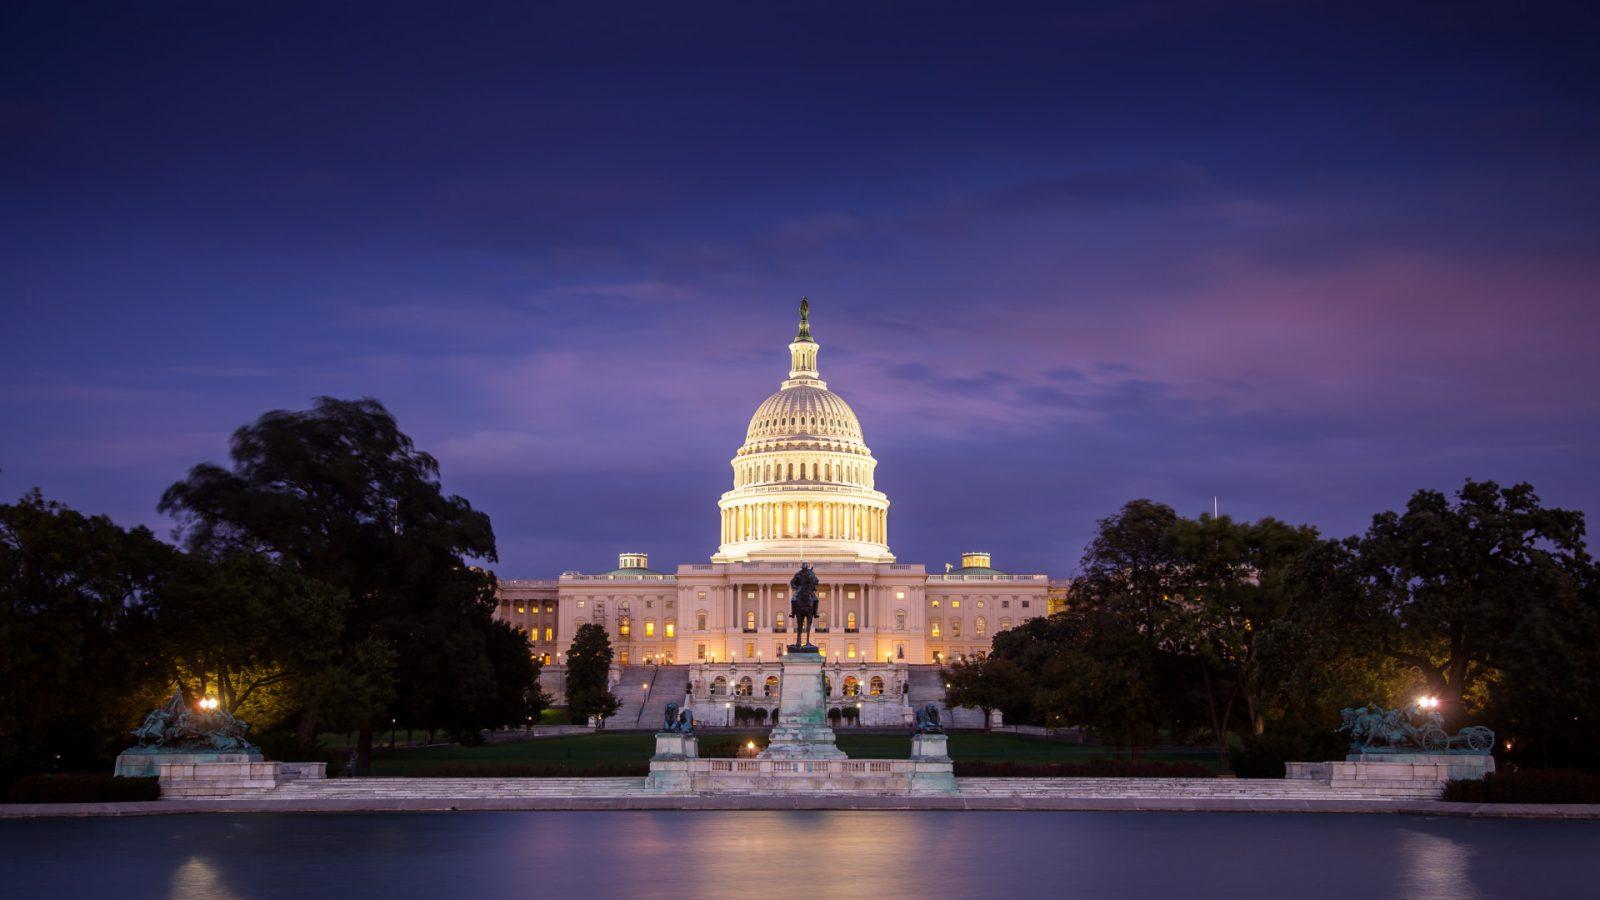 US Capitol Video Bing Wallpaper Download 1600x900